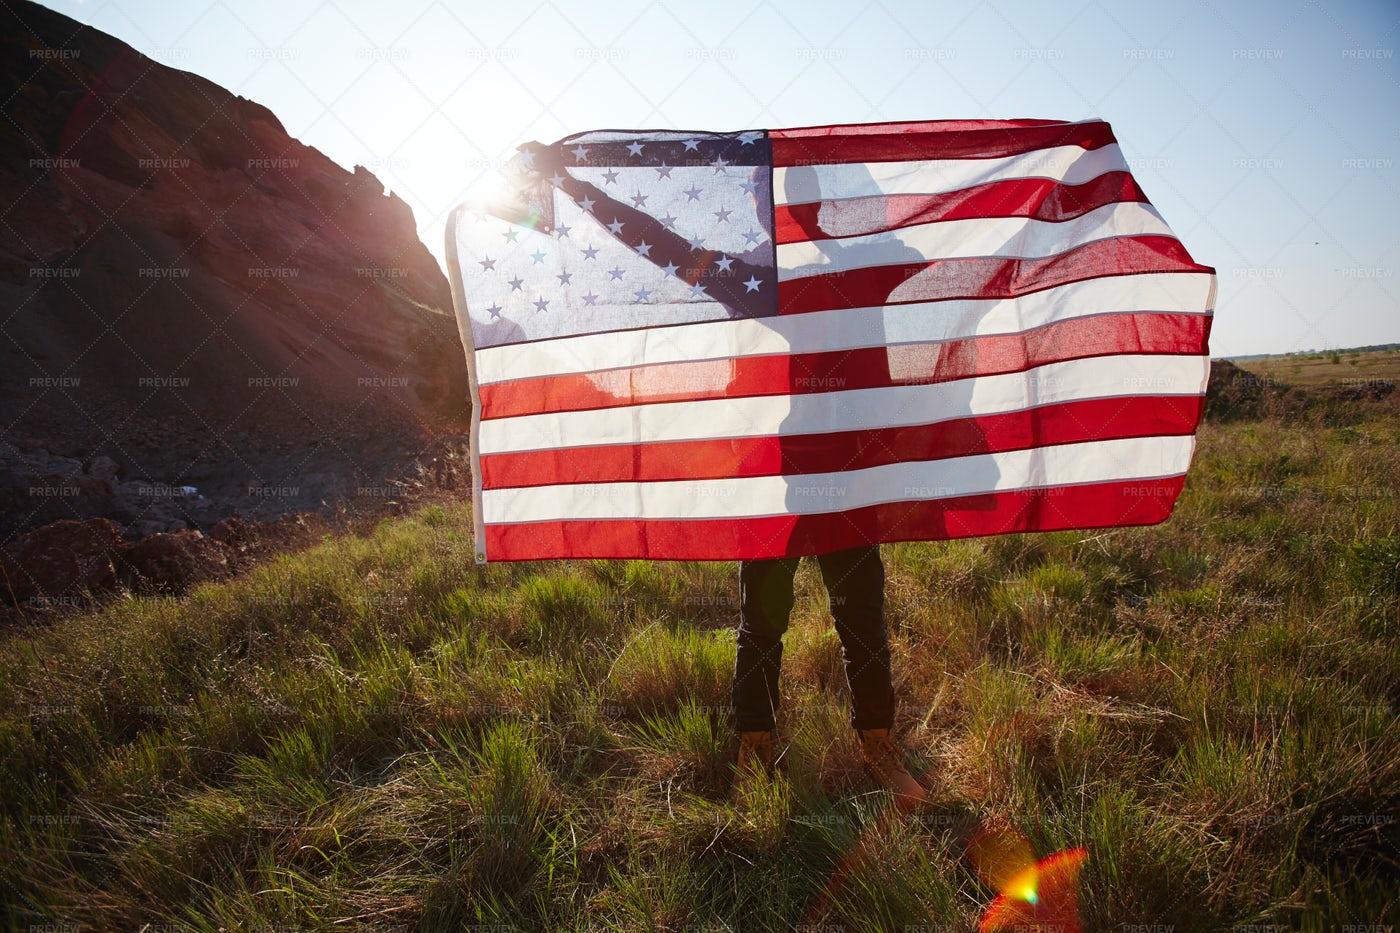 American Patriot In Nature: Stock Photos